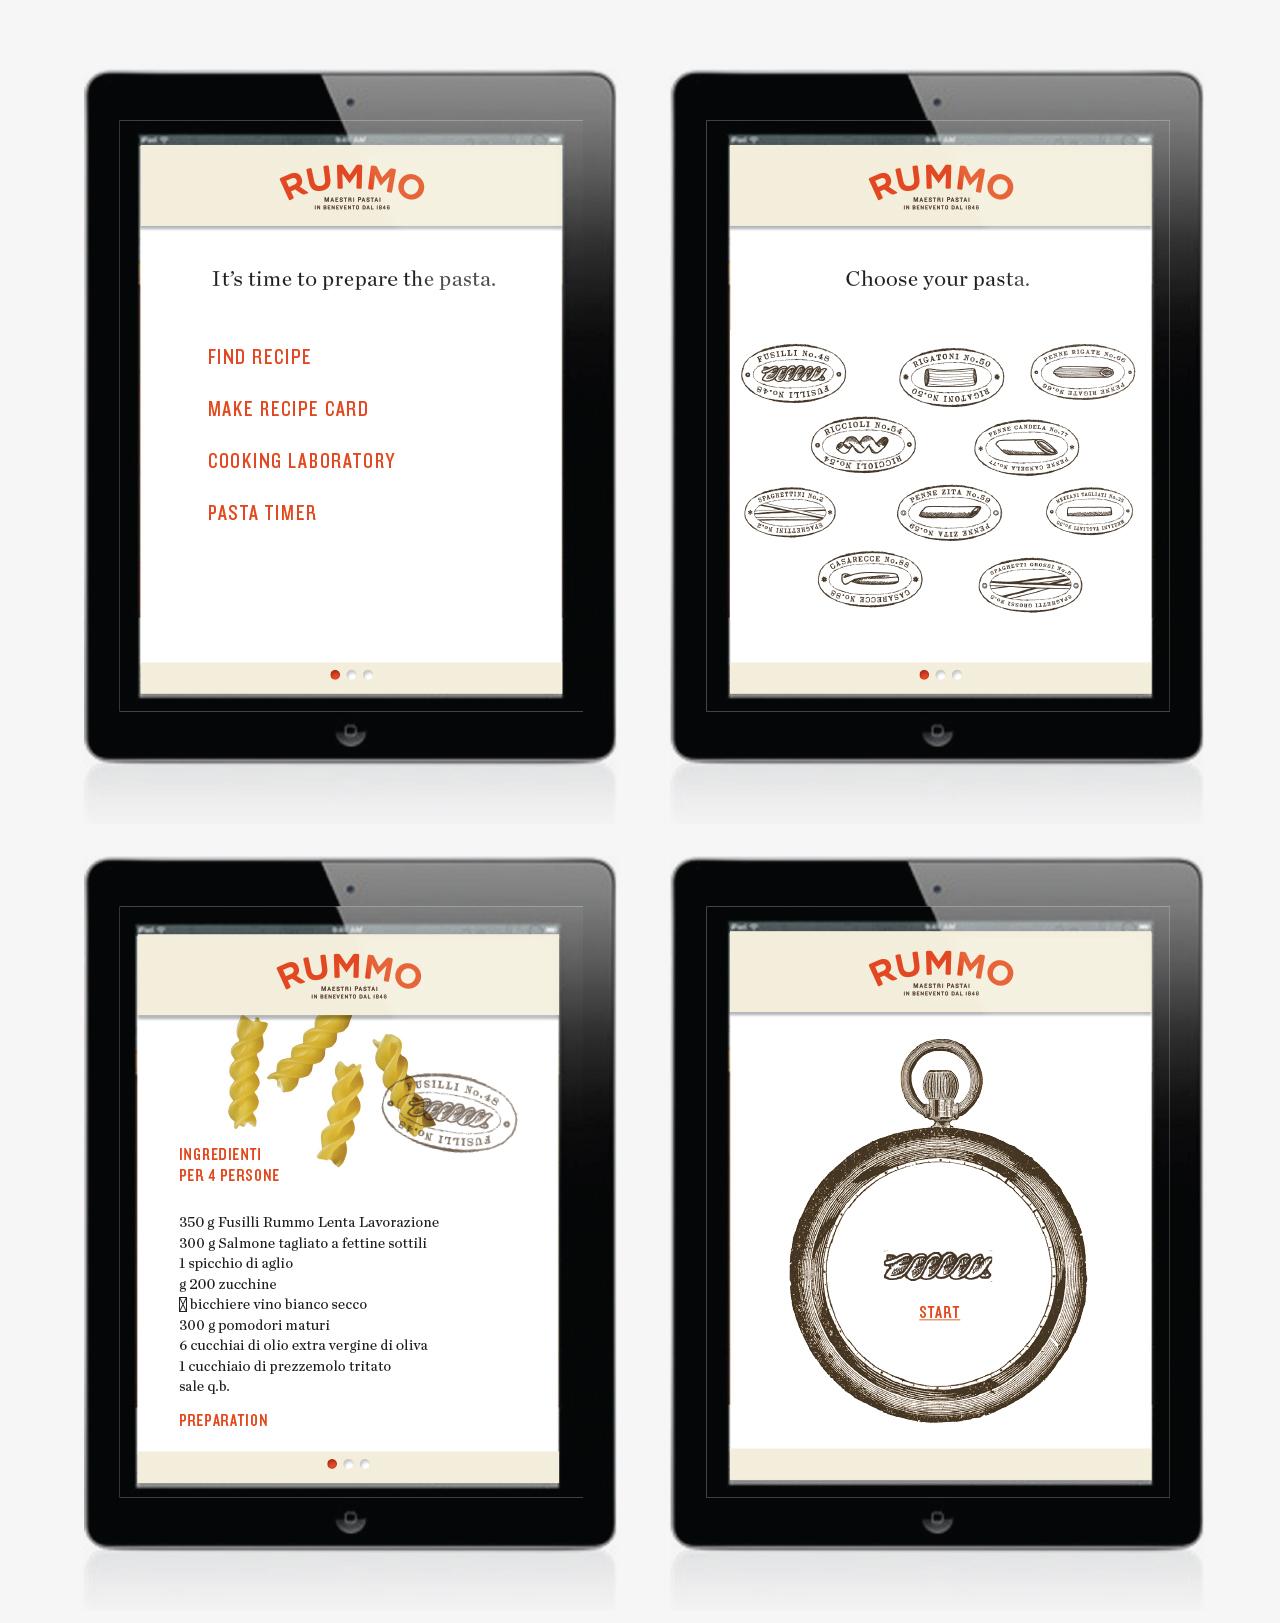 Proposed app including recipe finder, inspiration, preparation instructions, pasta-cooking timer.